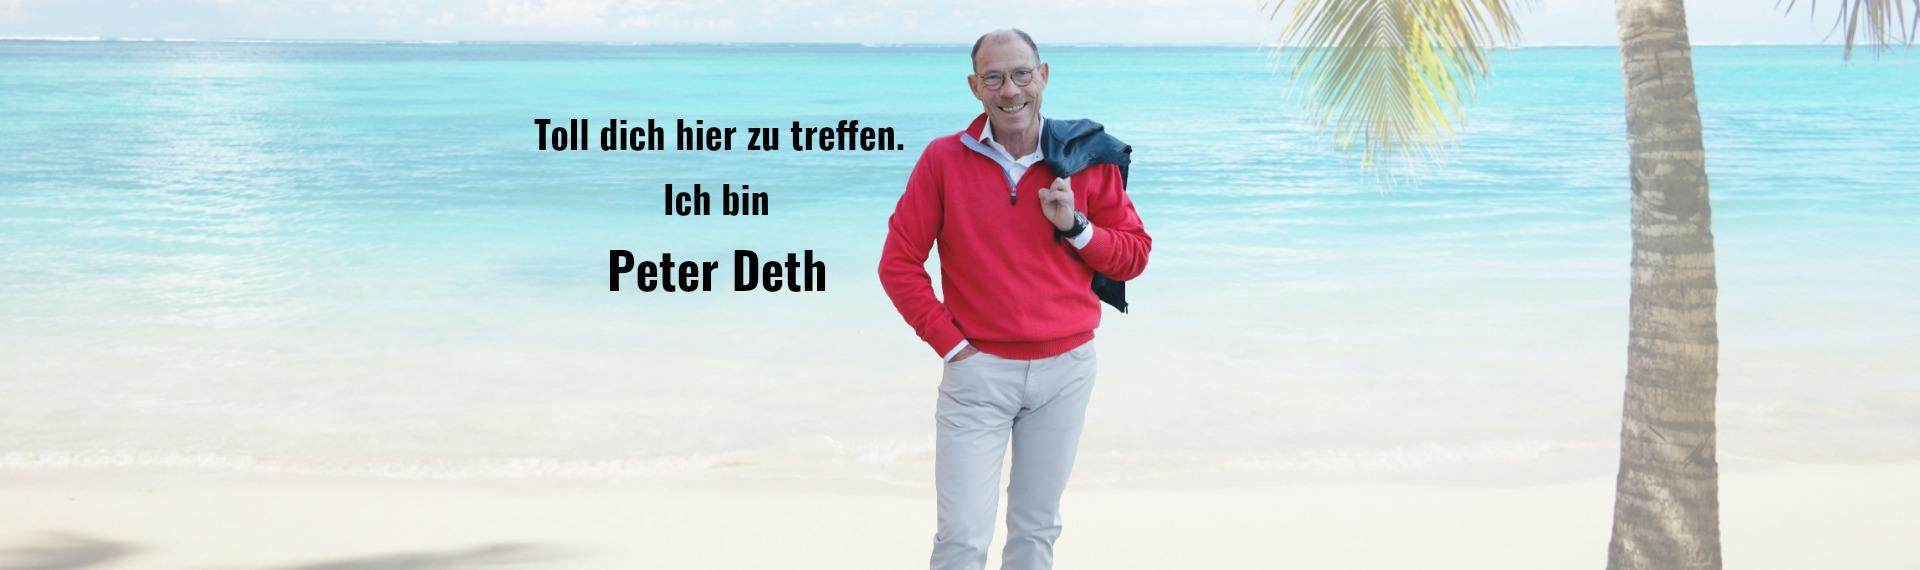 About Peter Deth German